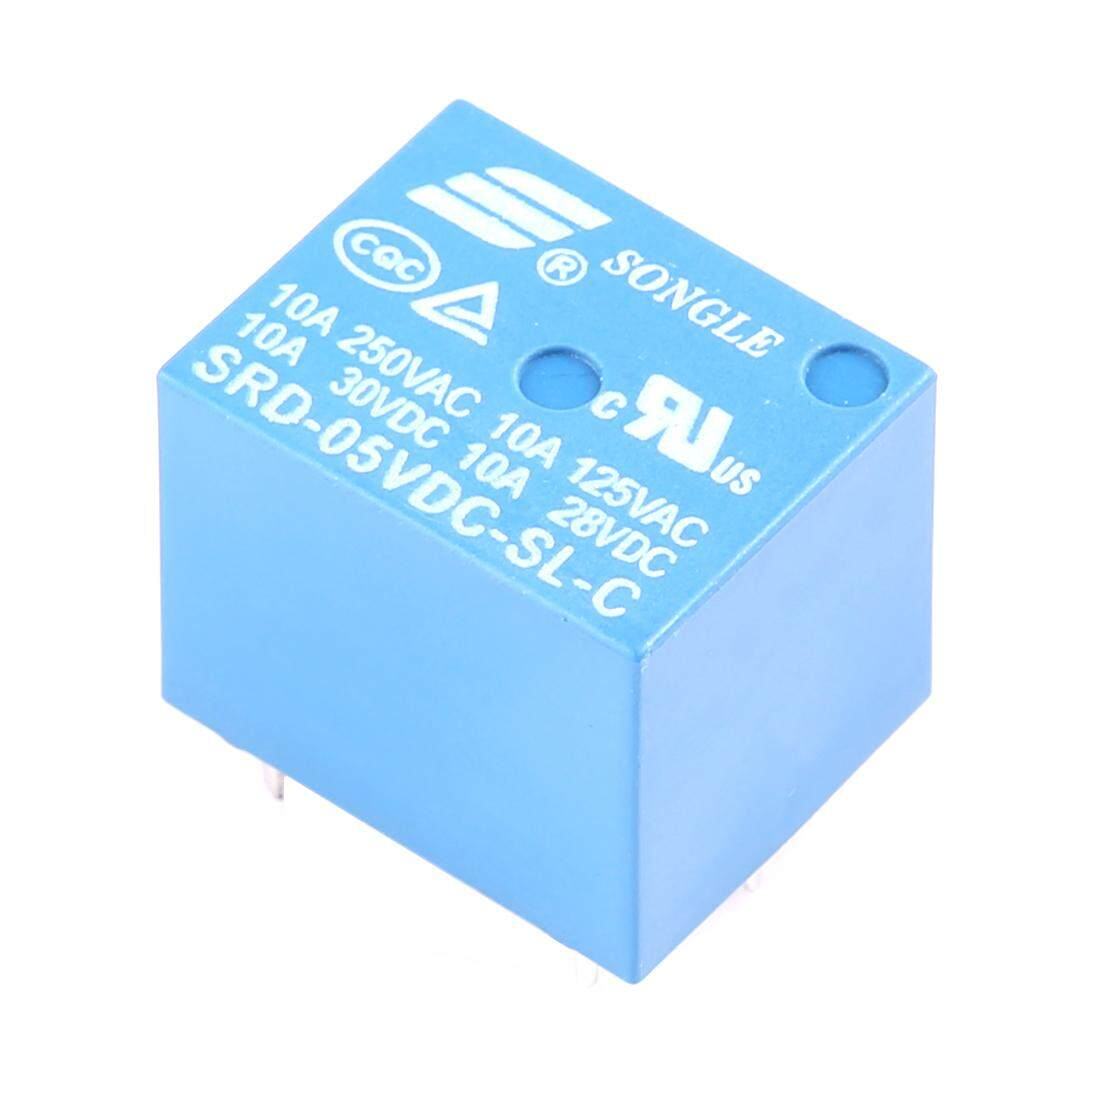 Fitur Lt365 5 Pcs 5vdc Power Supply Relay Sumber 5pin Untuk 5v Pin Biru Arduino Internasional 3